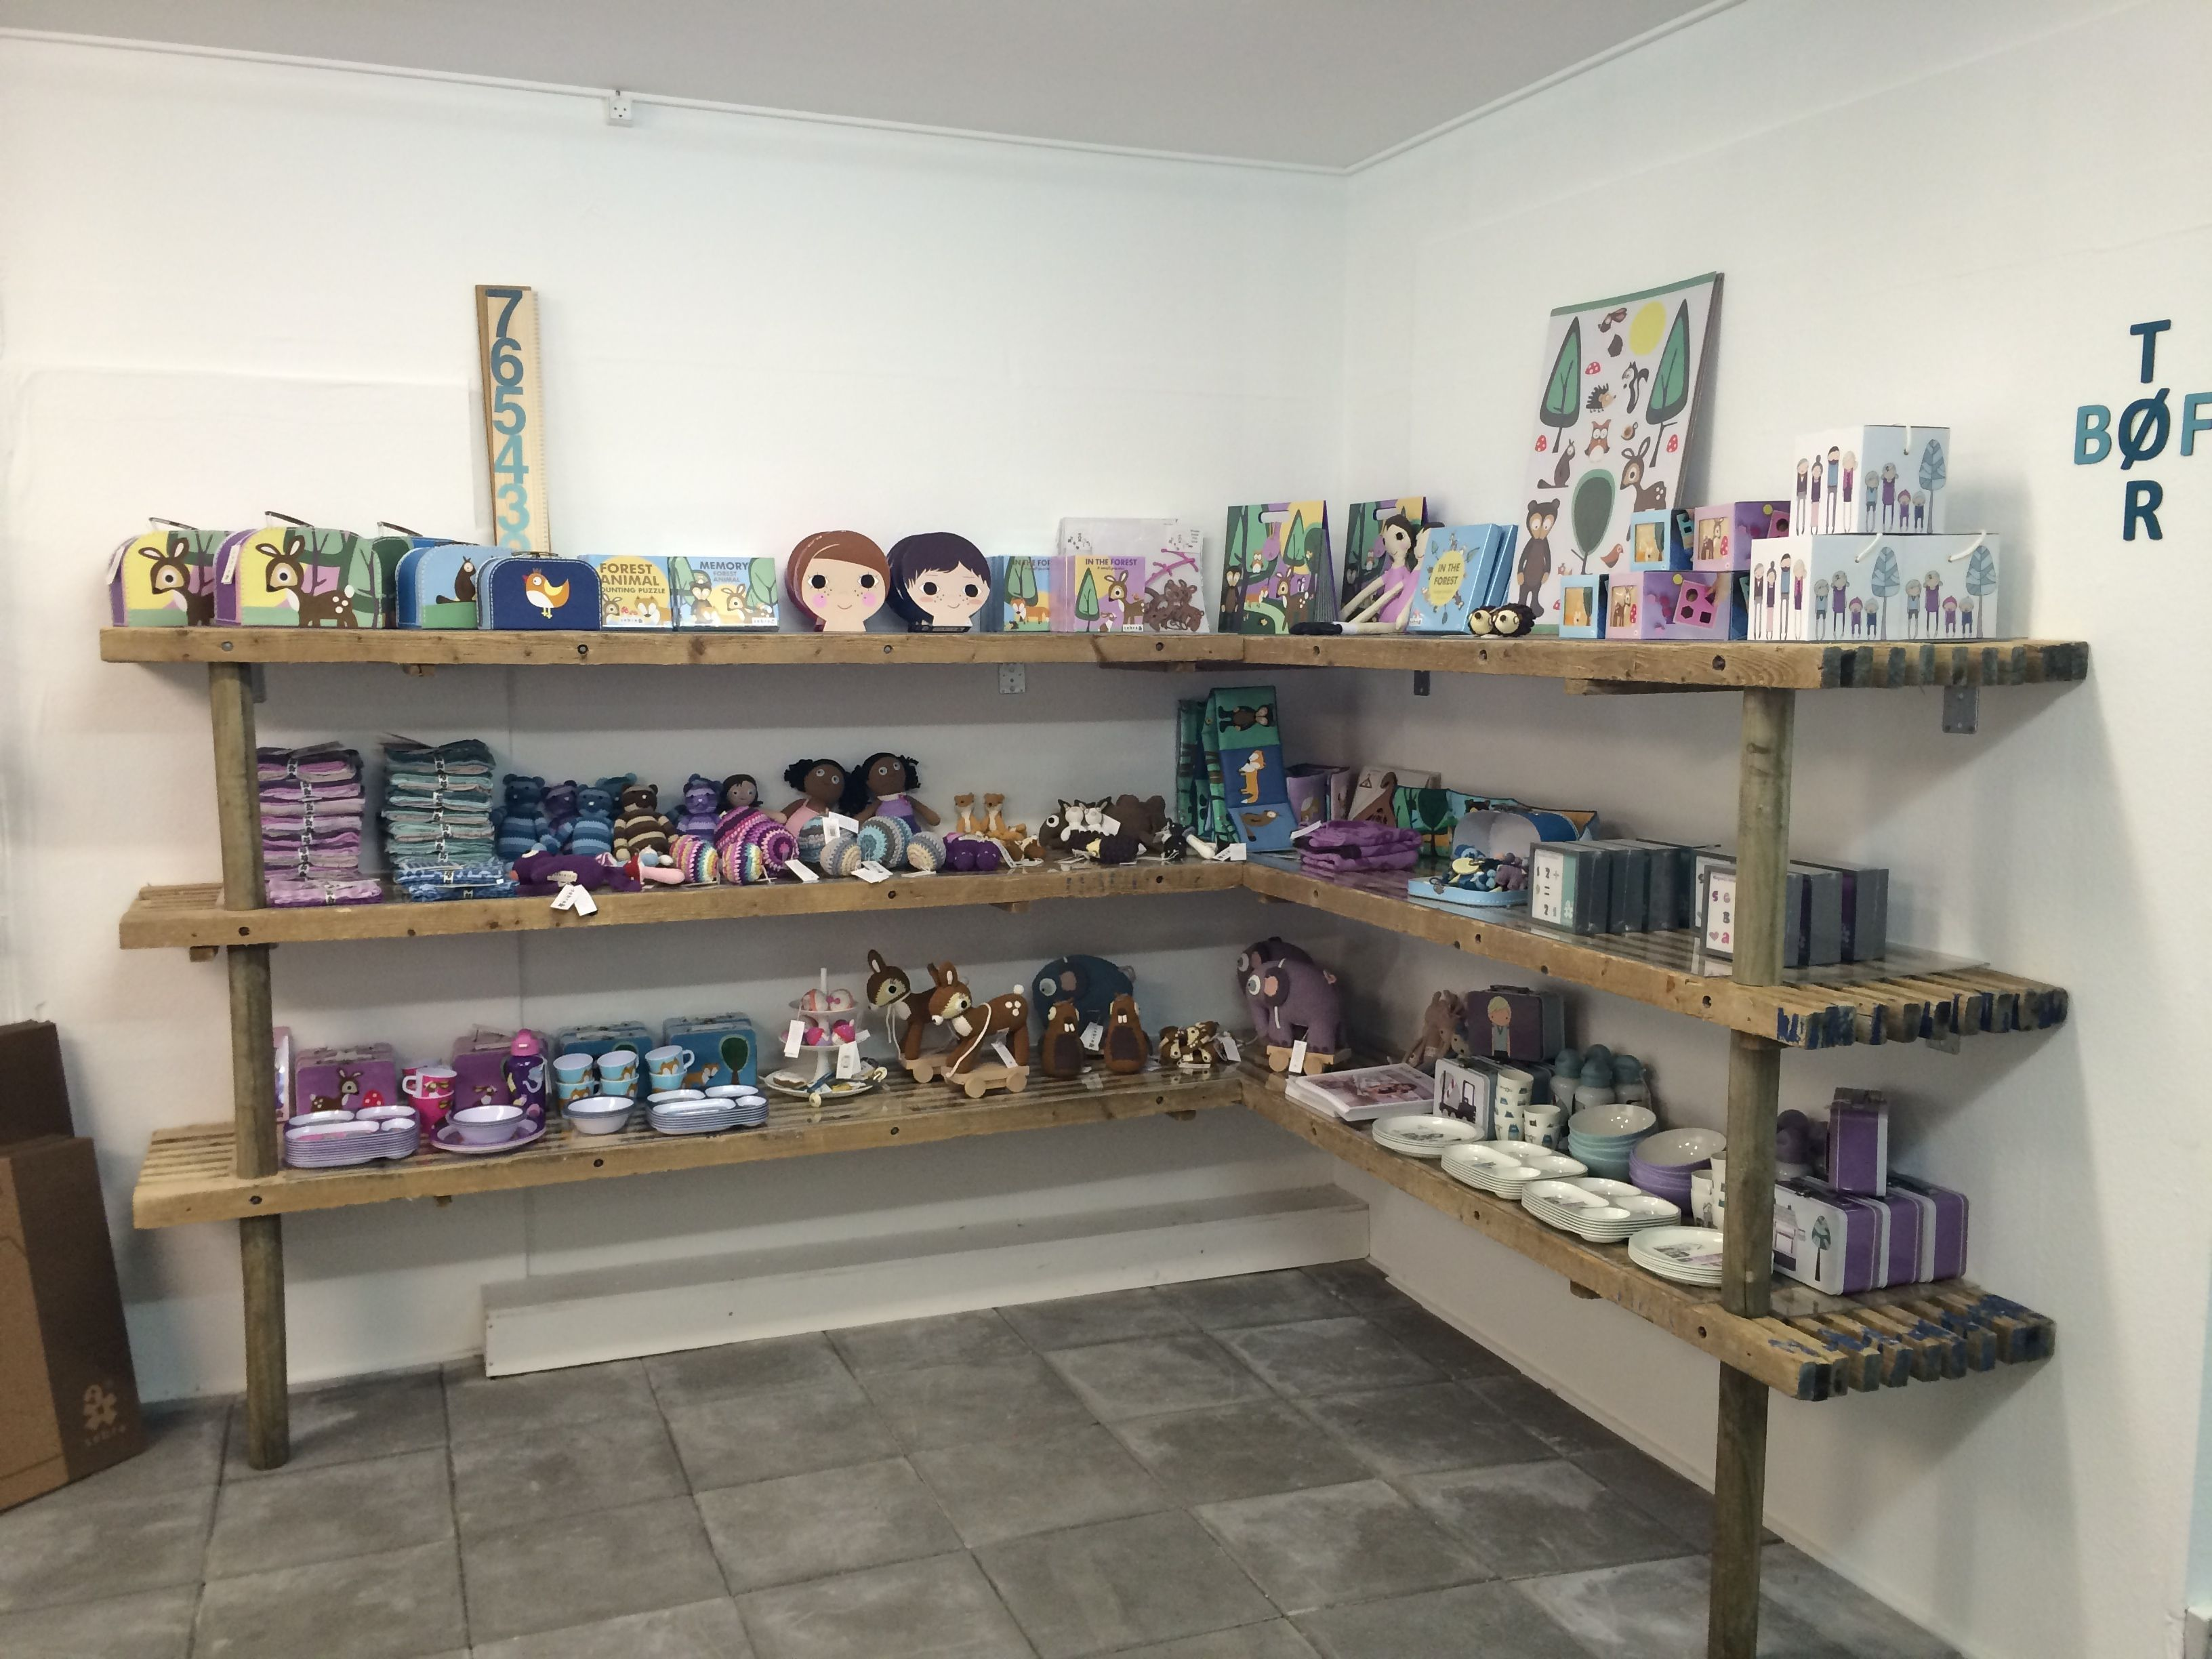 Det er 2 måneder siden at Tinga Tango designbutik åbnede #designbutik#nyborg#butik#børn#børneværelse#sebra